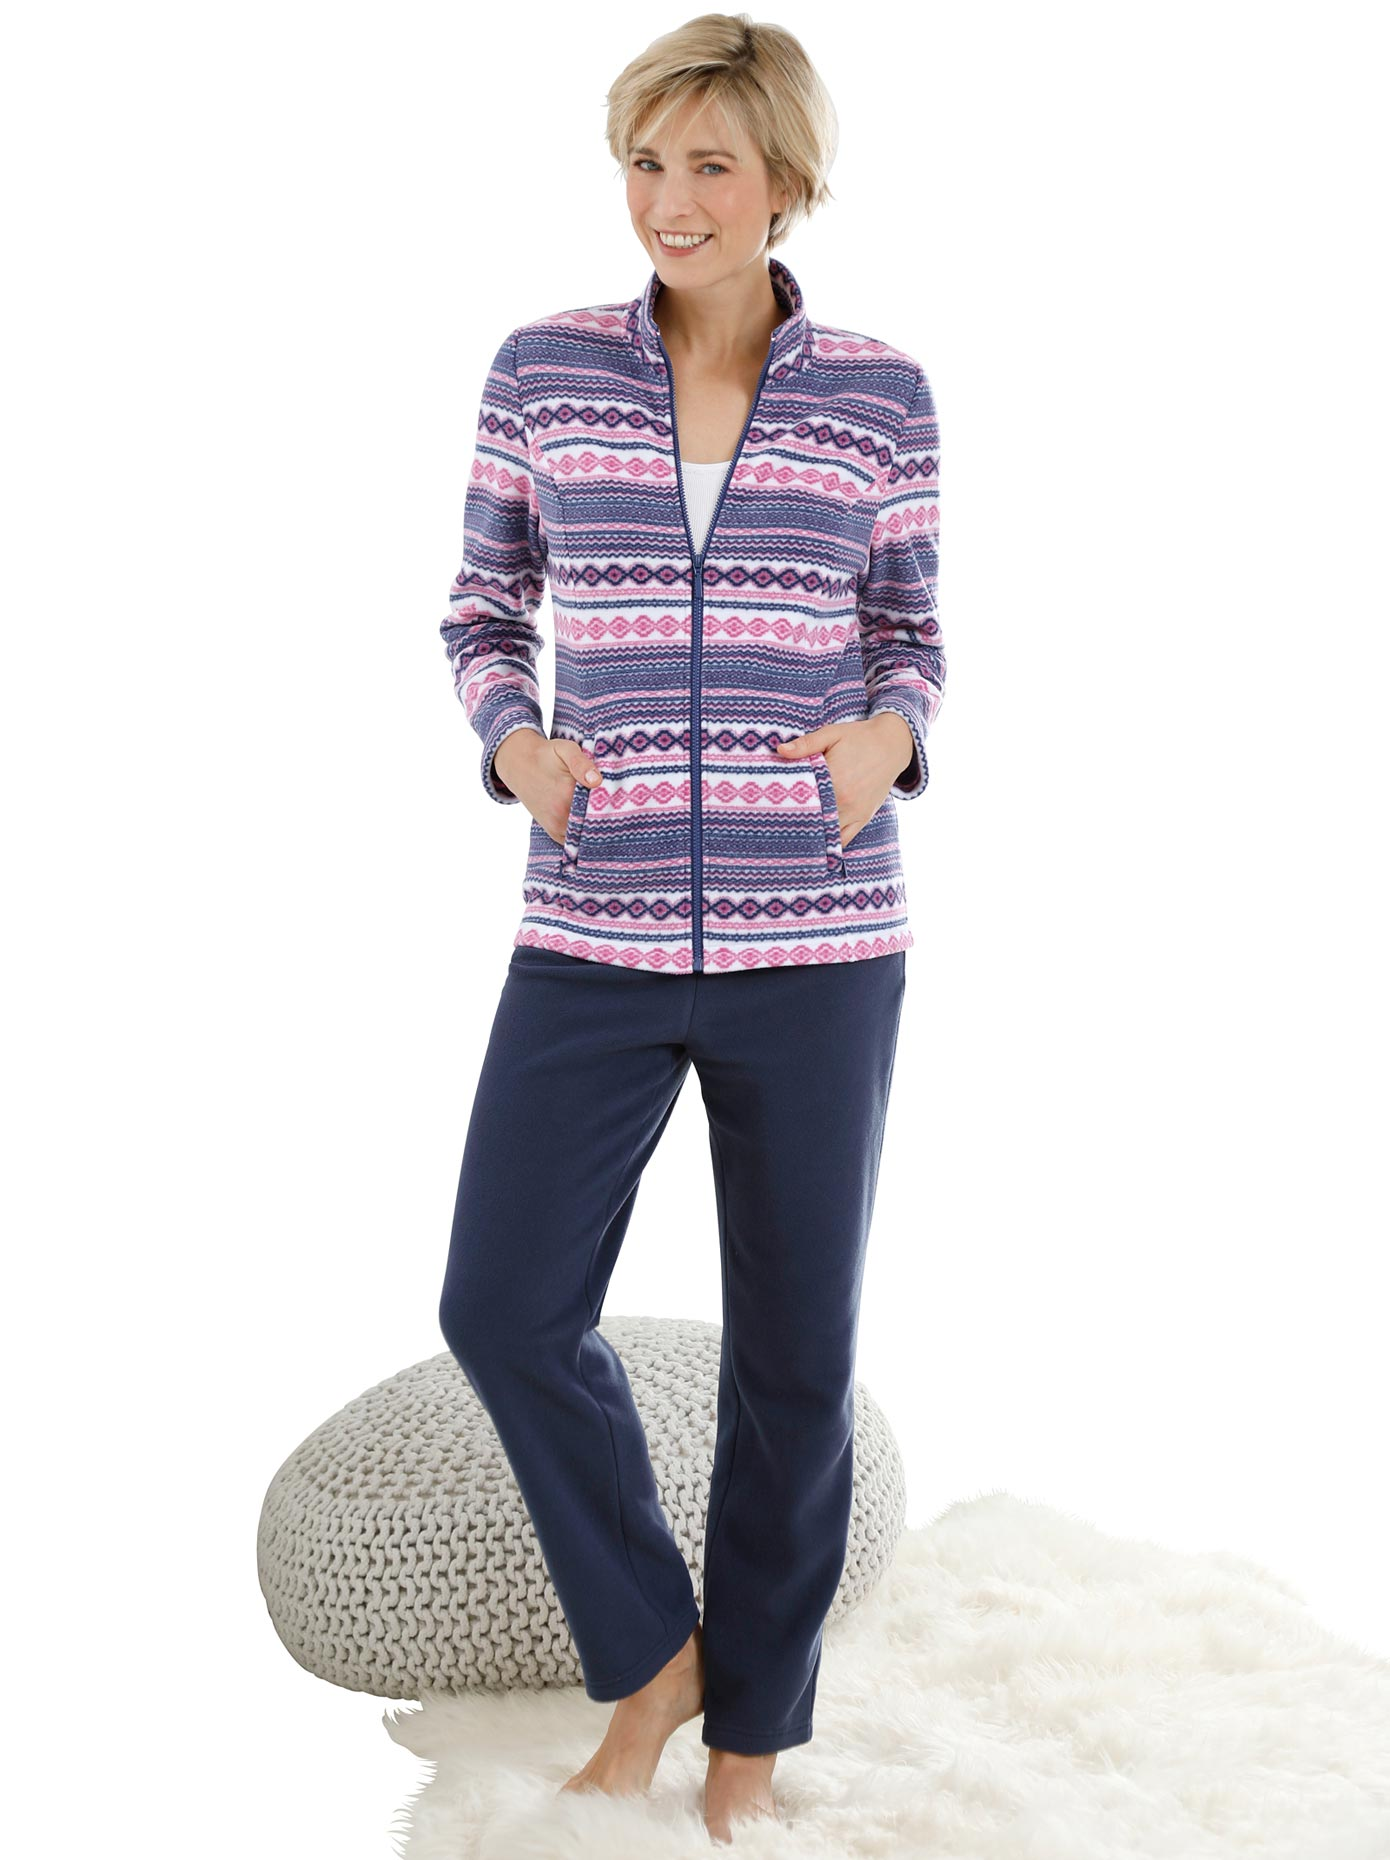 feel good Hausanzug aus weichem Fleece | Bekleidung > Homewear > Hausanzüge